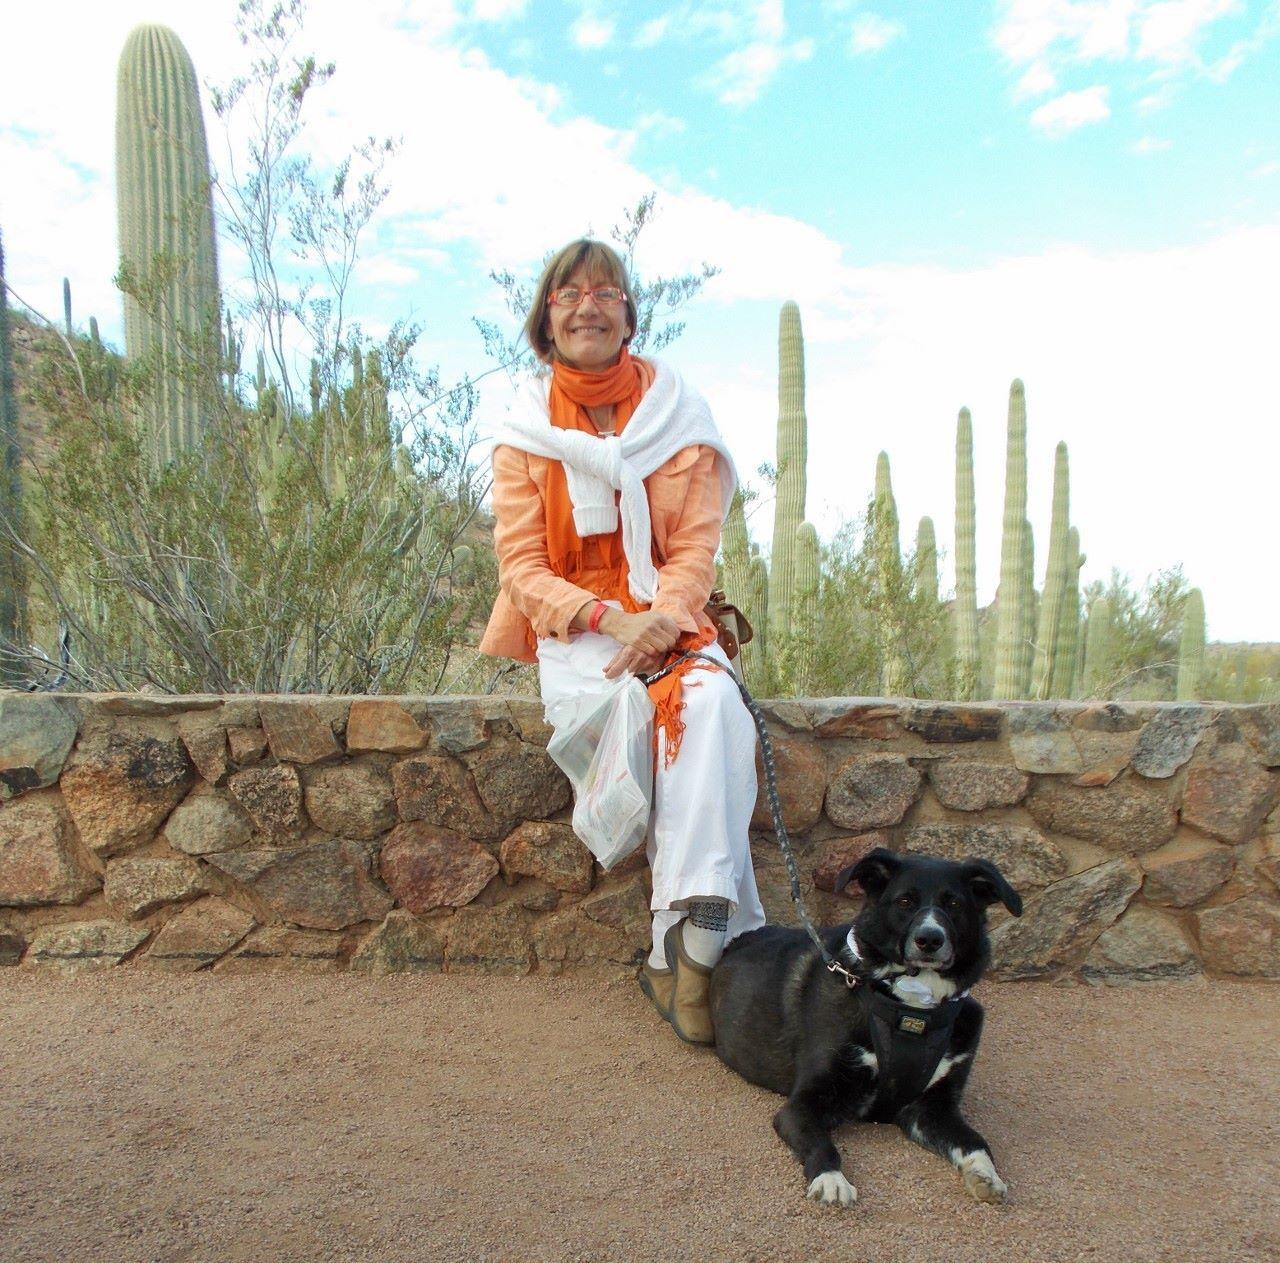 Bella Luna Tic enjoyed her day at the Desert Botanical Garden - especially the food treats